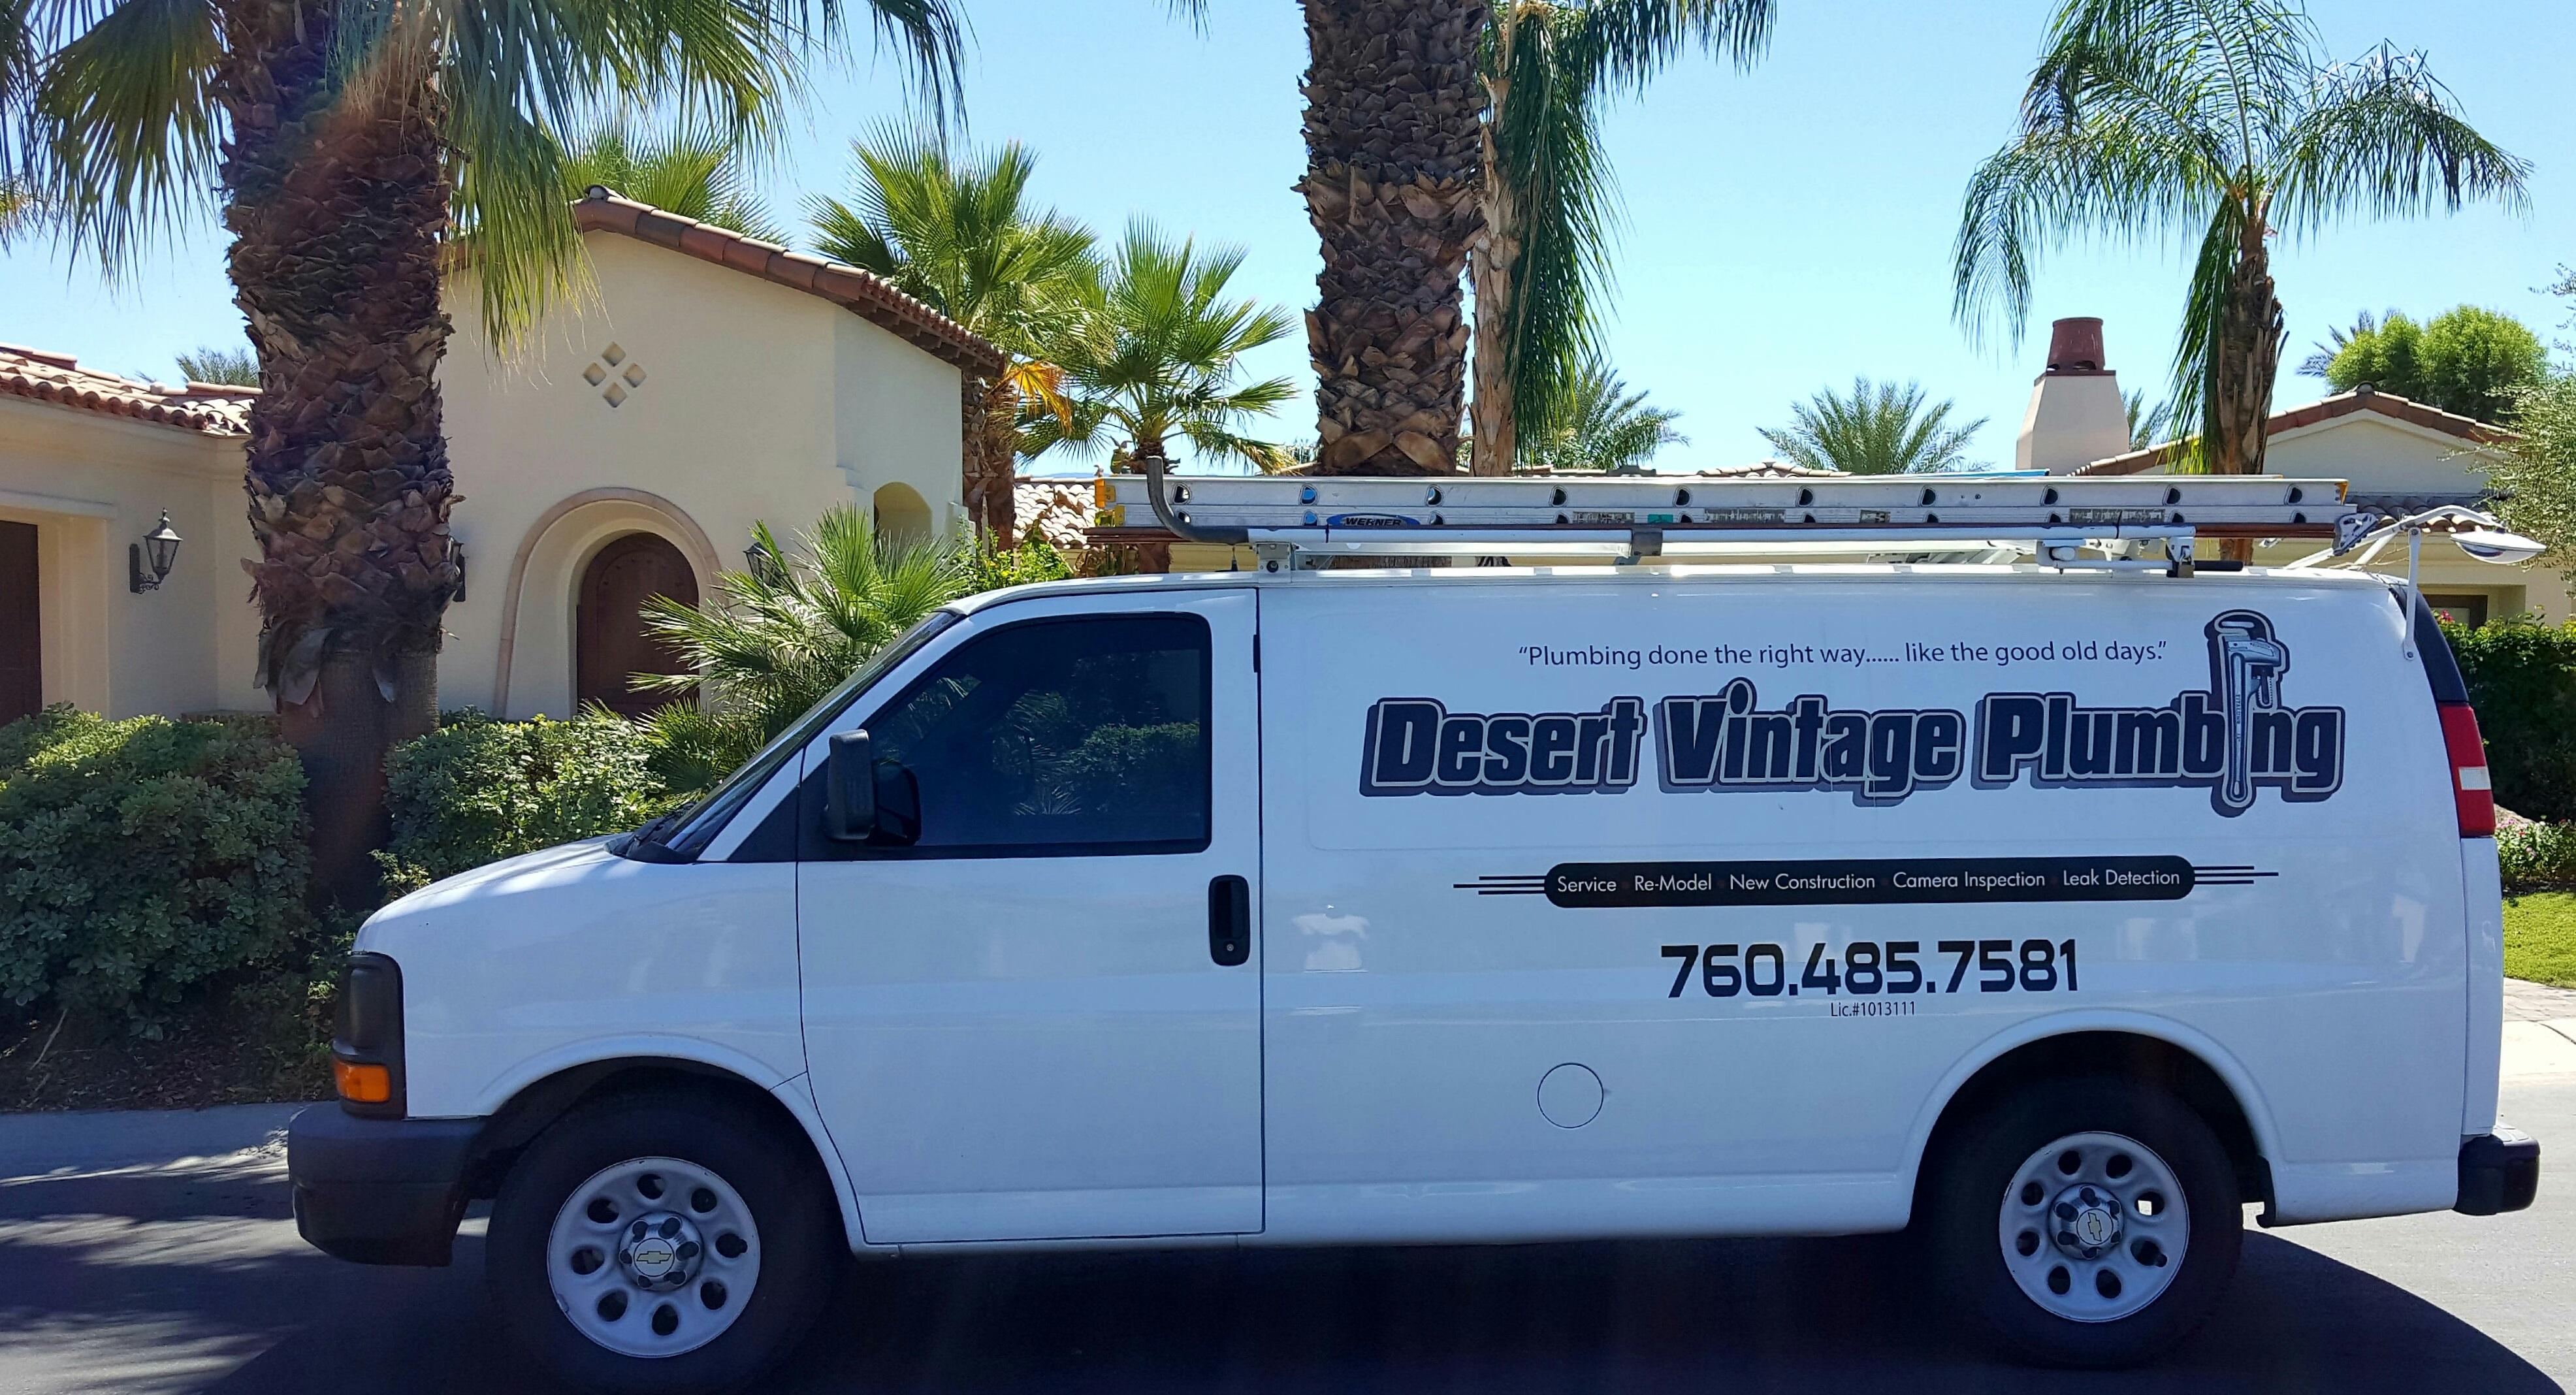 Desert Vintage Plumbing 44489 Town Center Way STE D #357, Palm ...